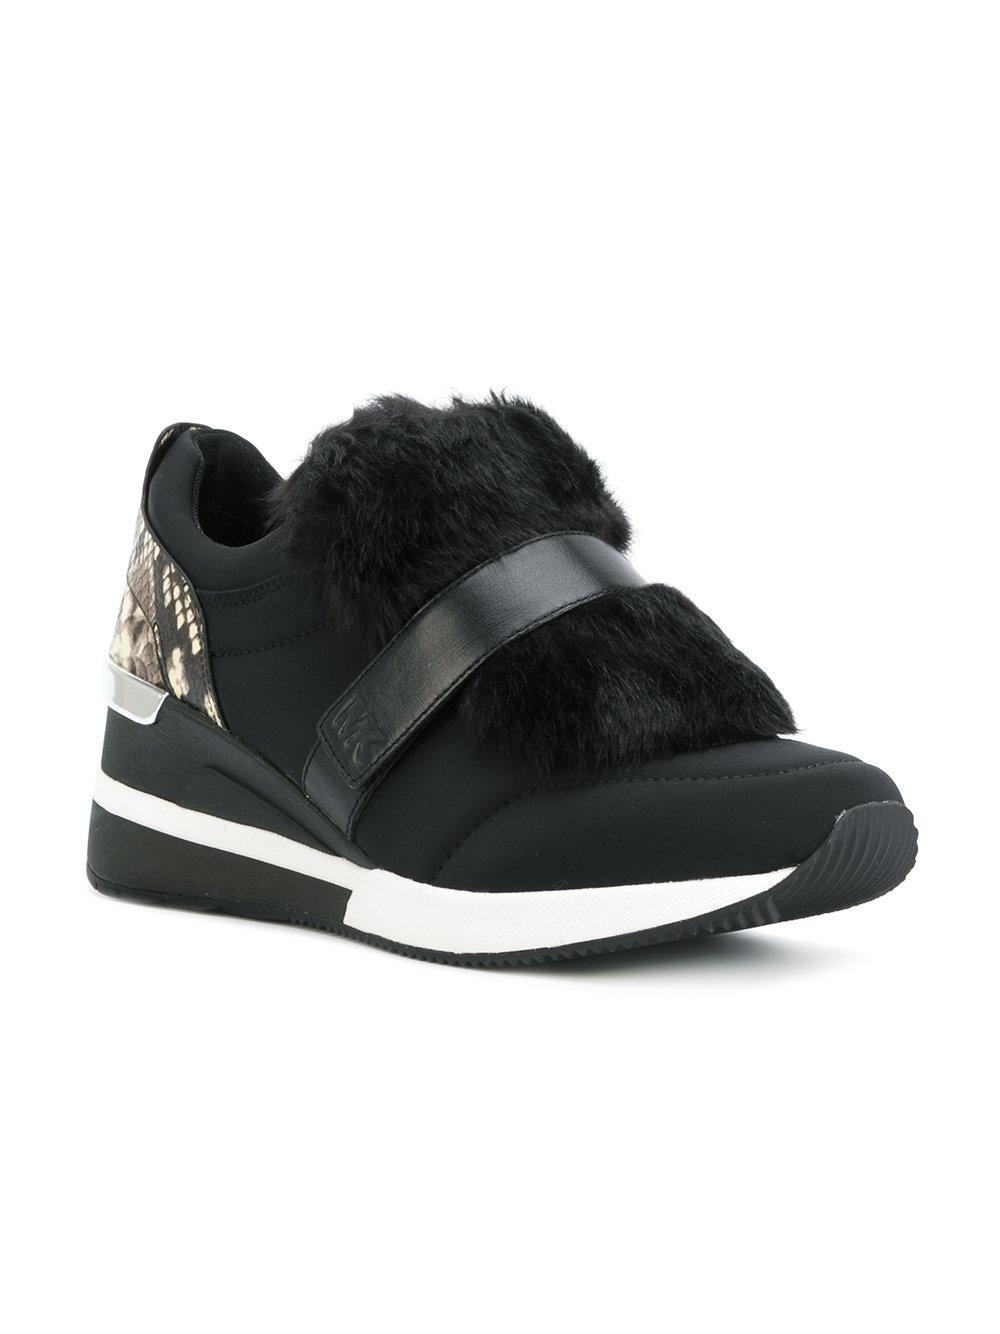 MICHAEL Michael Kors Maven Sneakers in Black